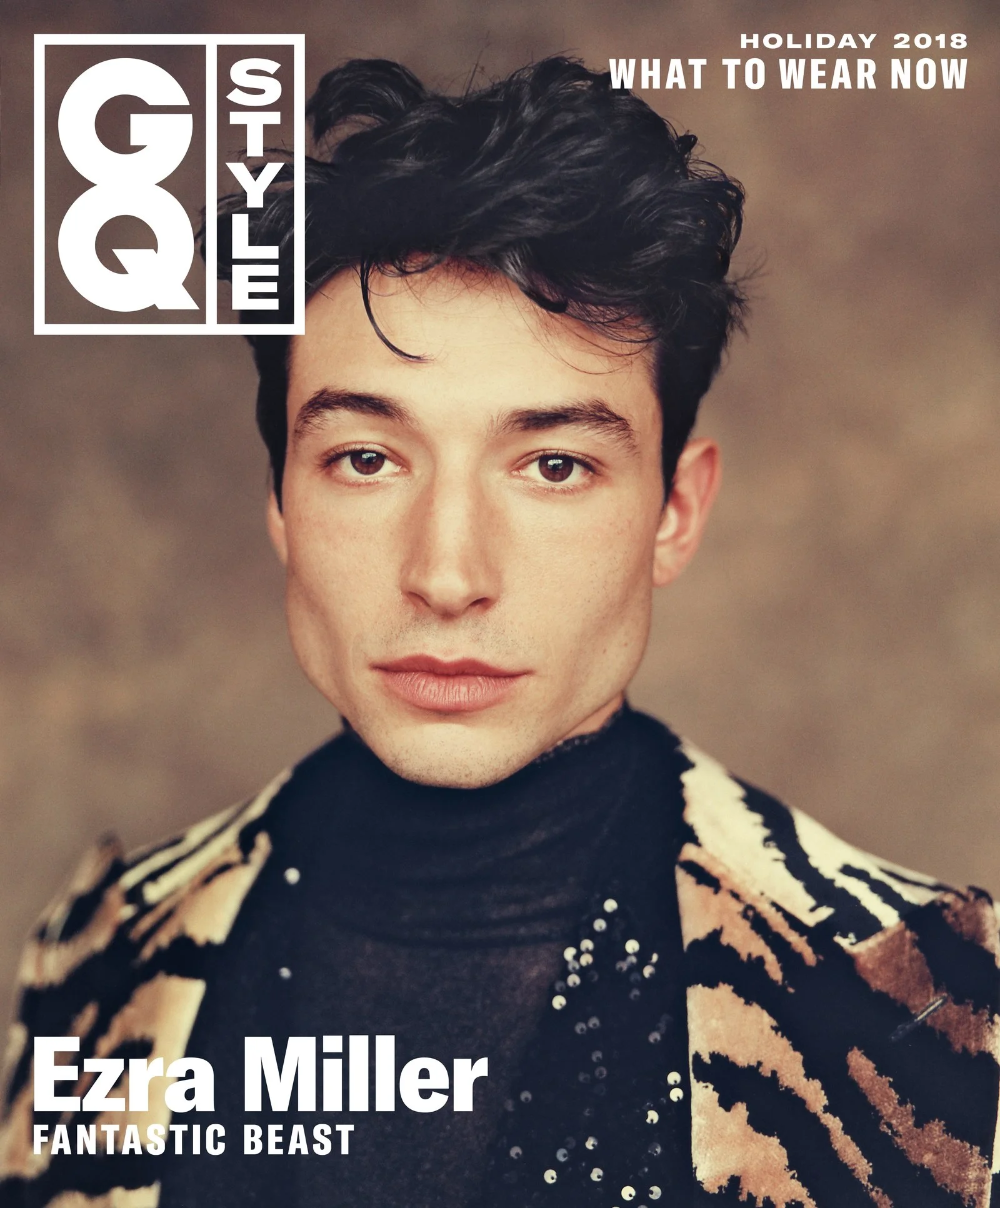 Ezra Miller Is the Gender-Bending, Goat-Delivering Hollywood Star of the Future #hollywoodstars